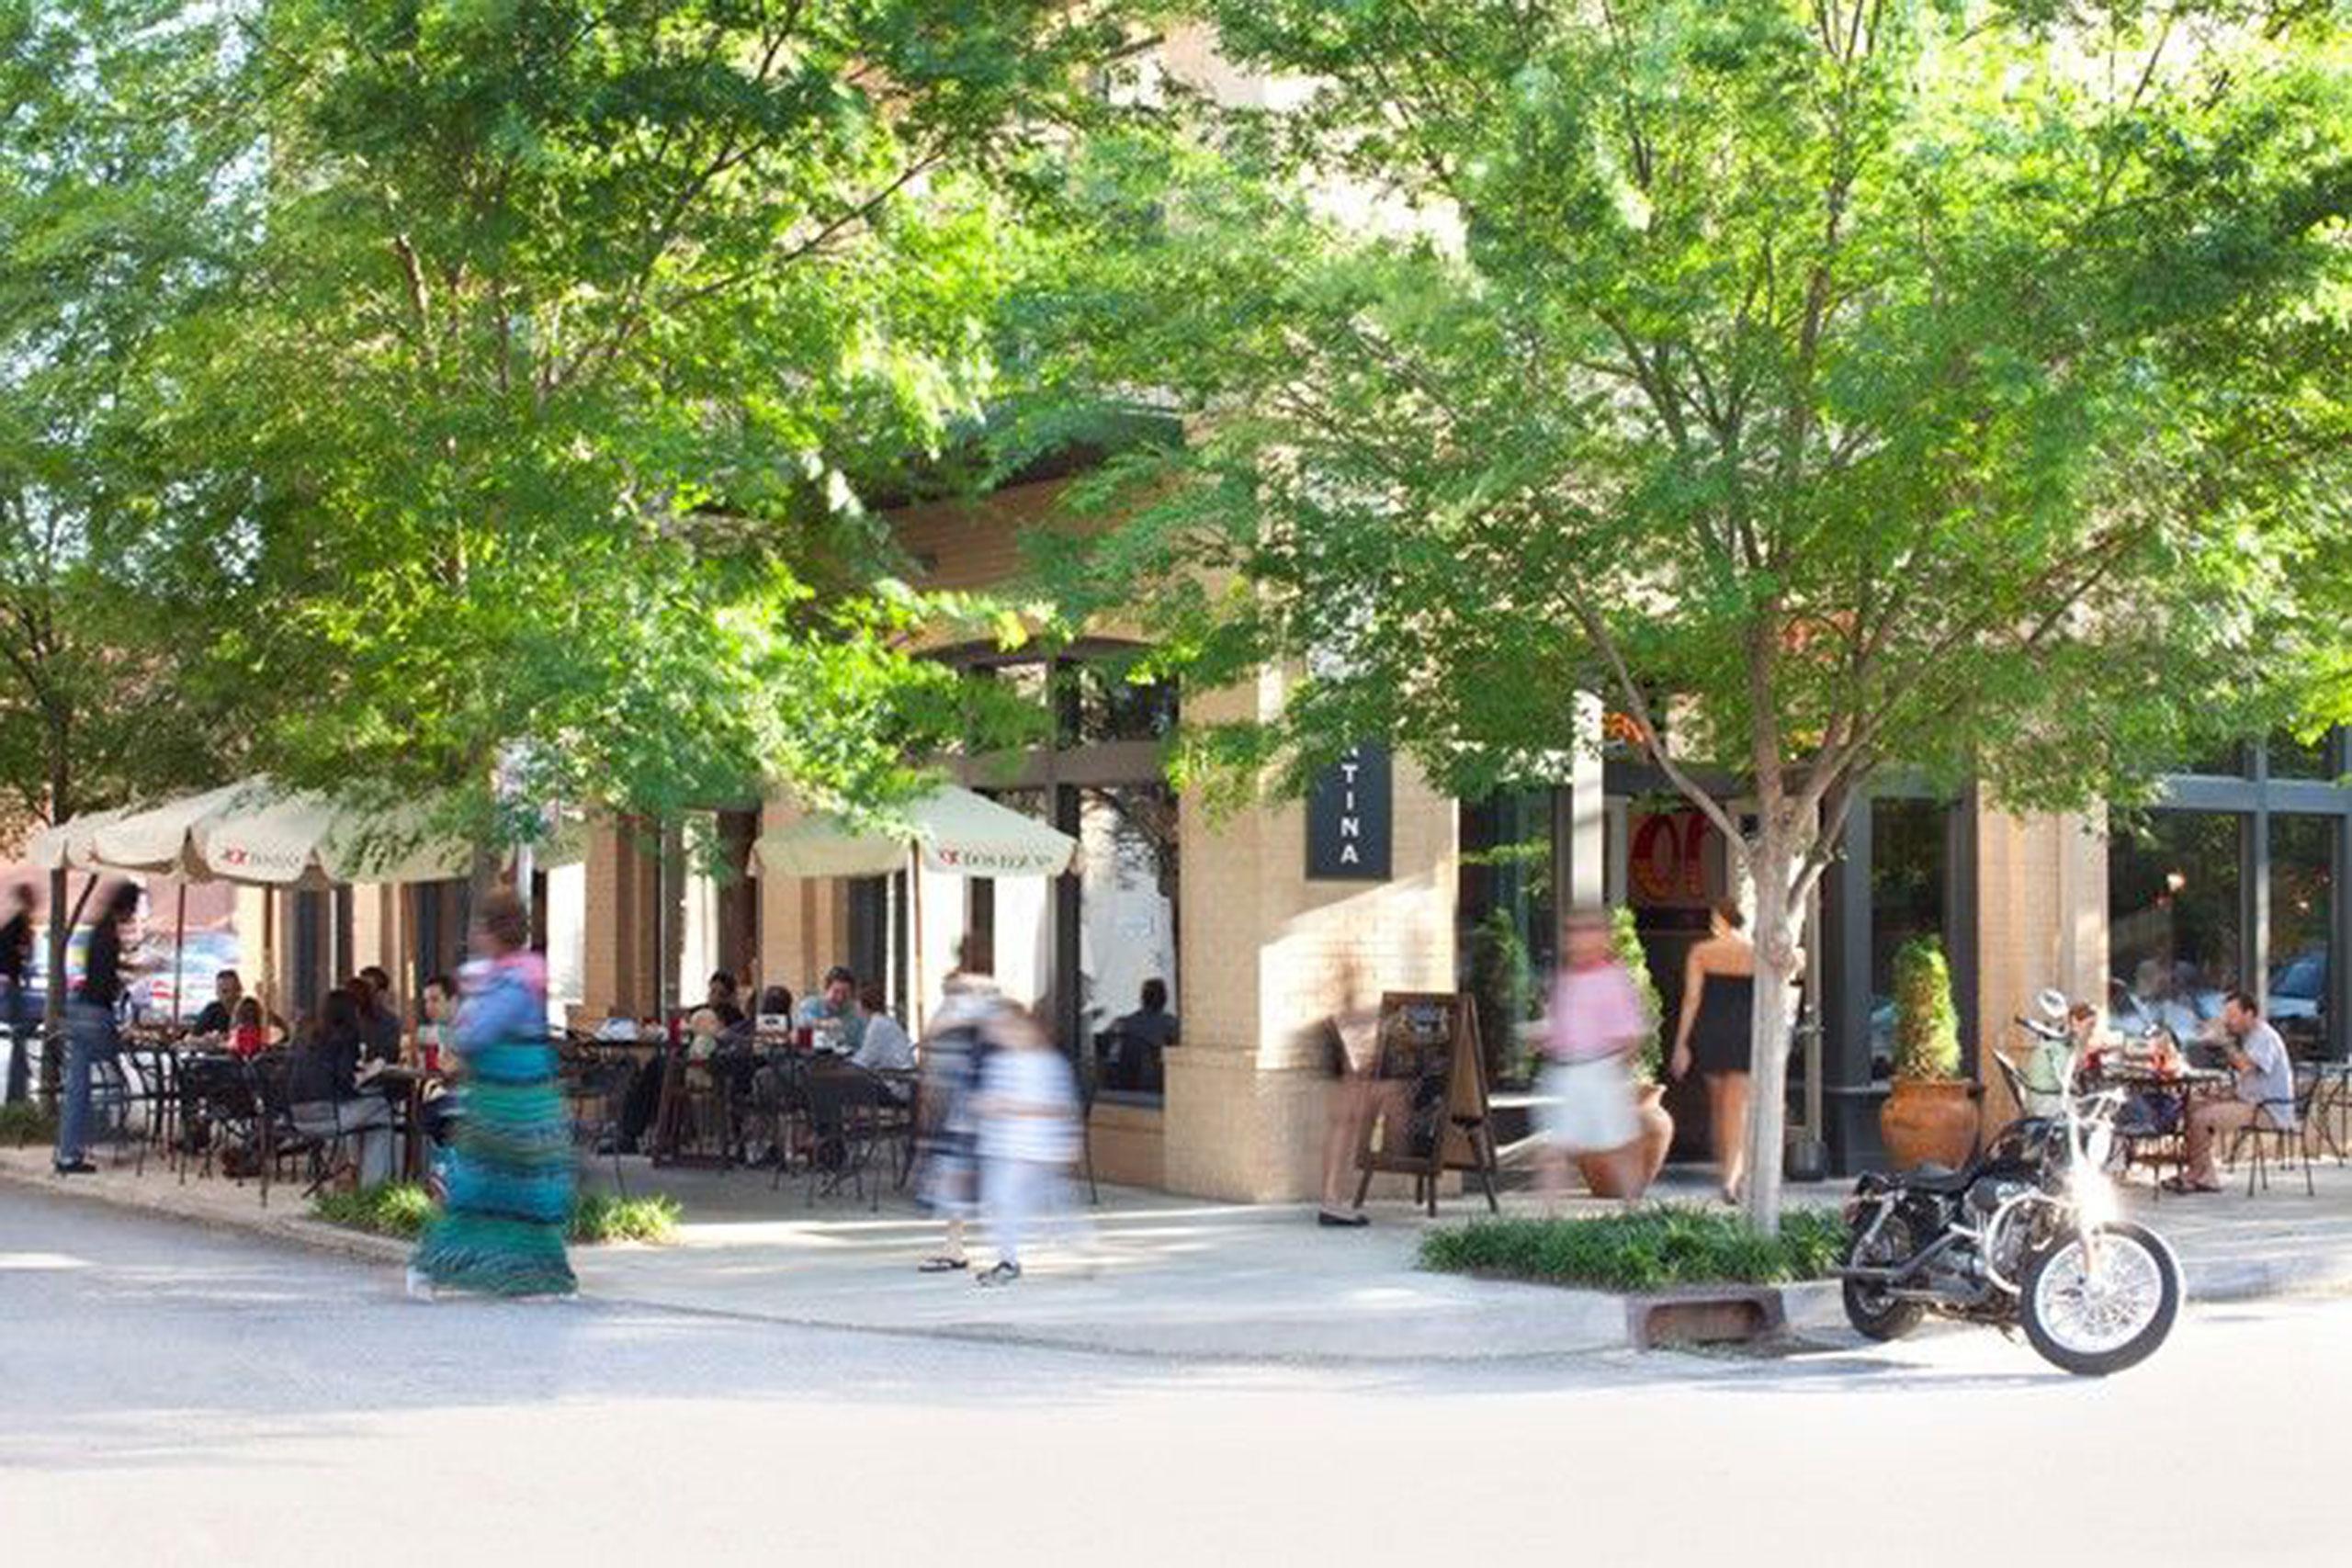 Glenwood-Park-Street-Retail